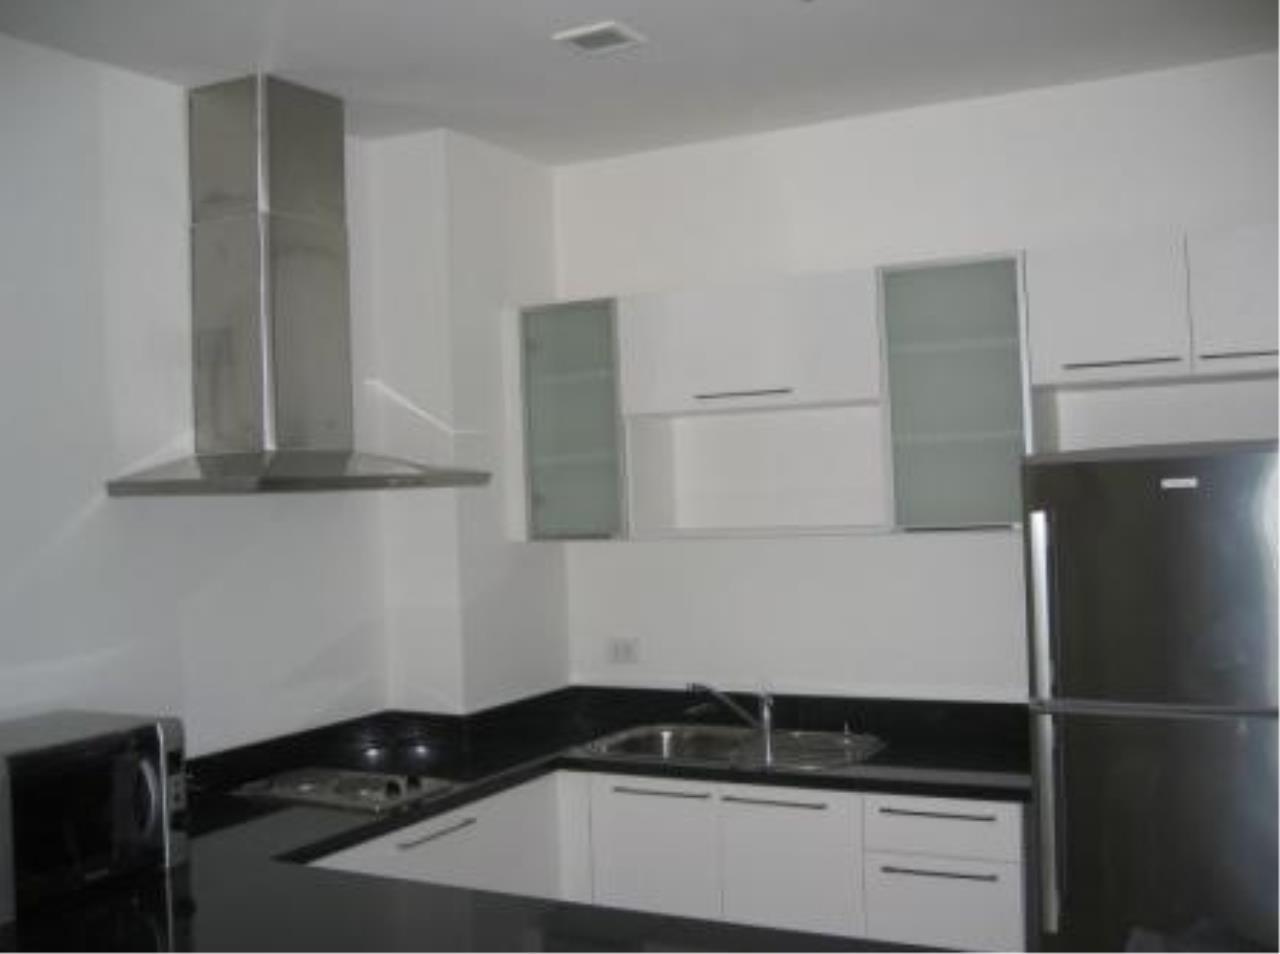 RE/MAX Properties Agency's 1 Bedroom for Rent Nusasiri Grand Condo 2